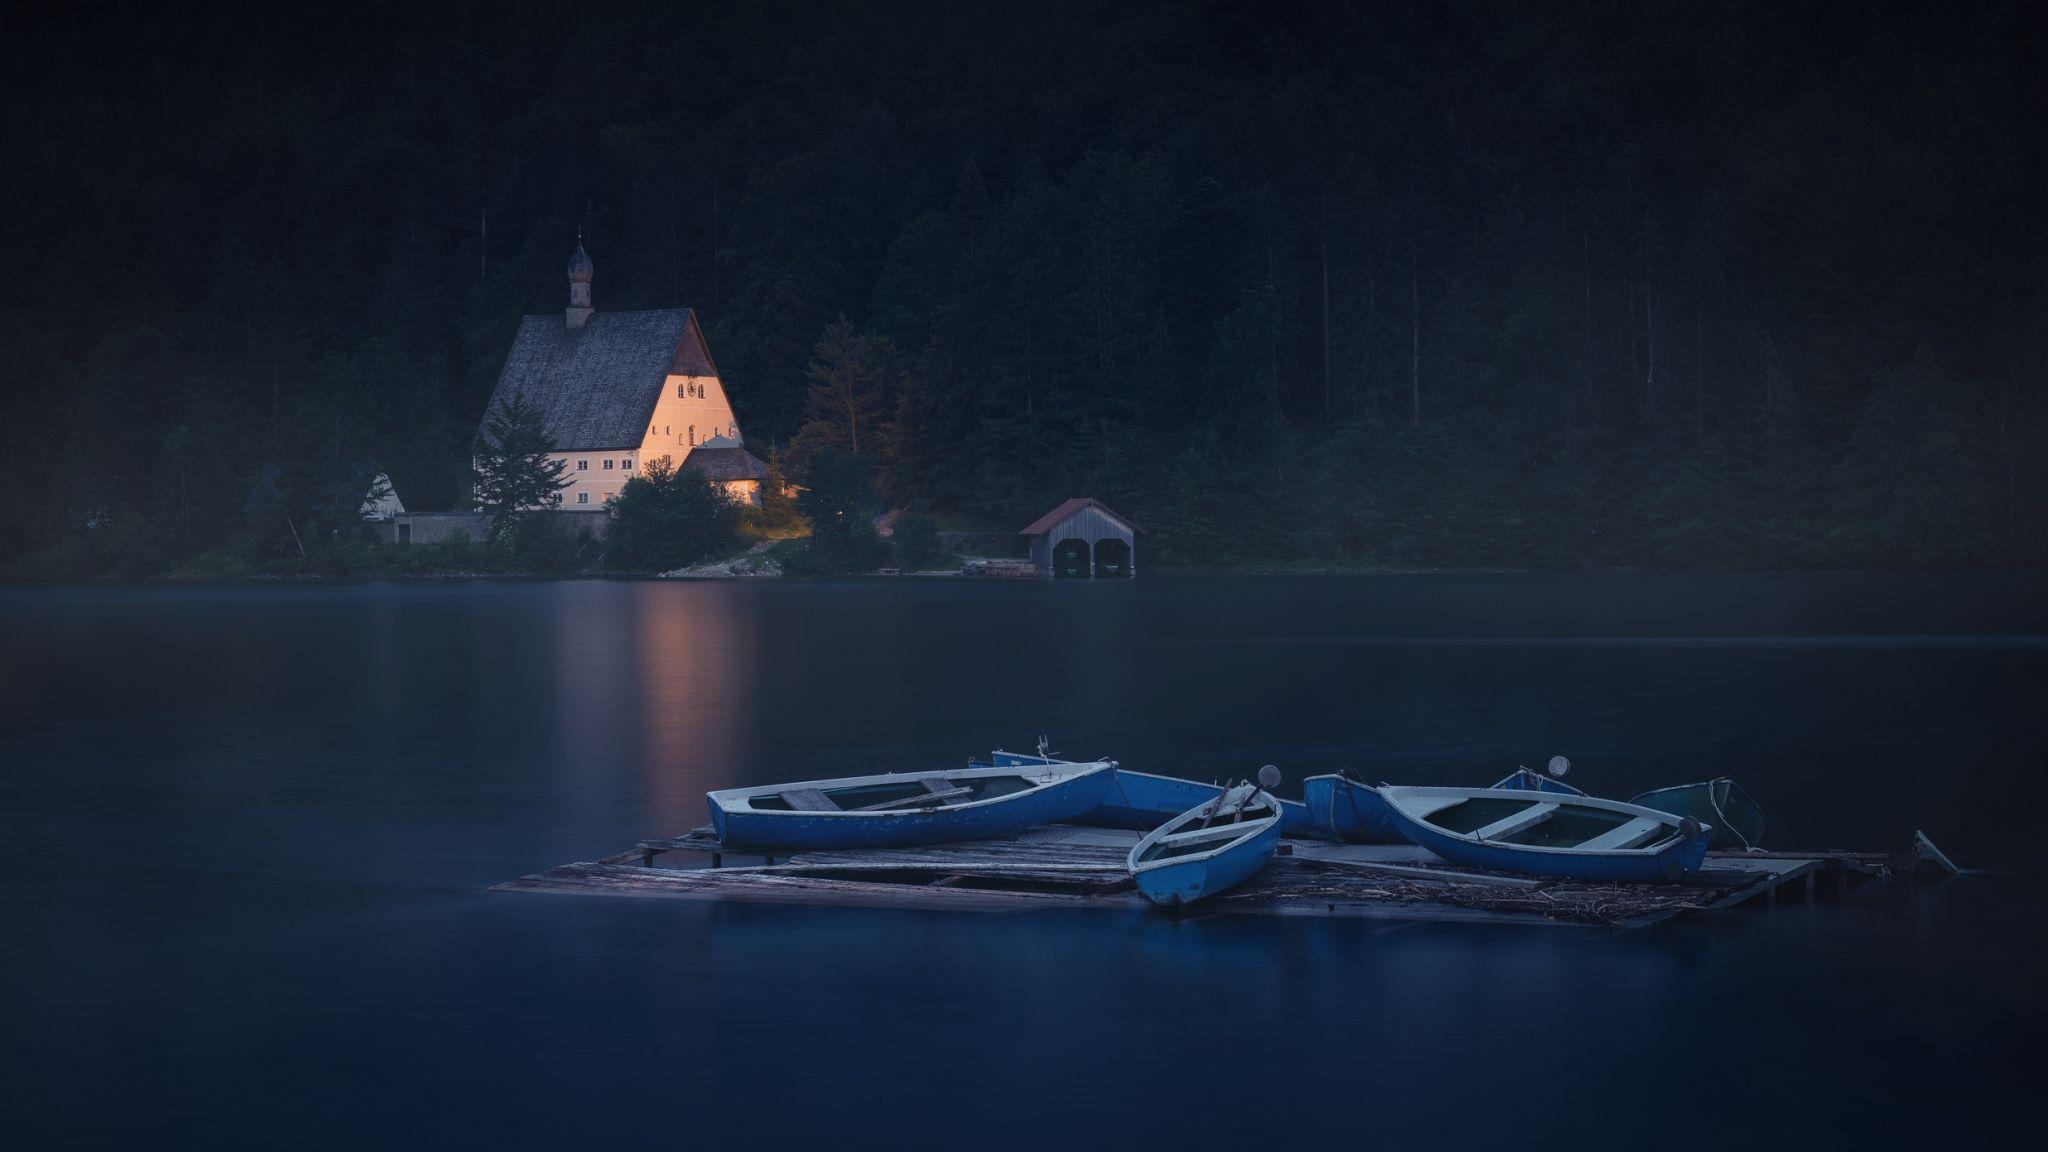 Klösterl Walchensee, Germany